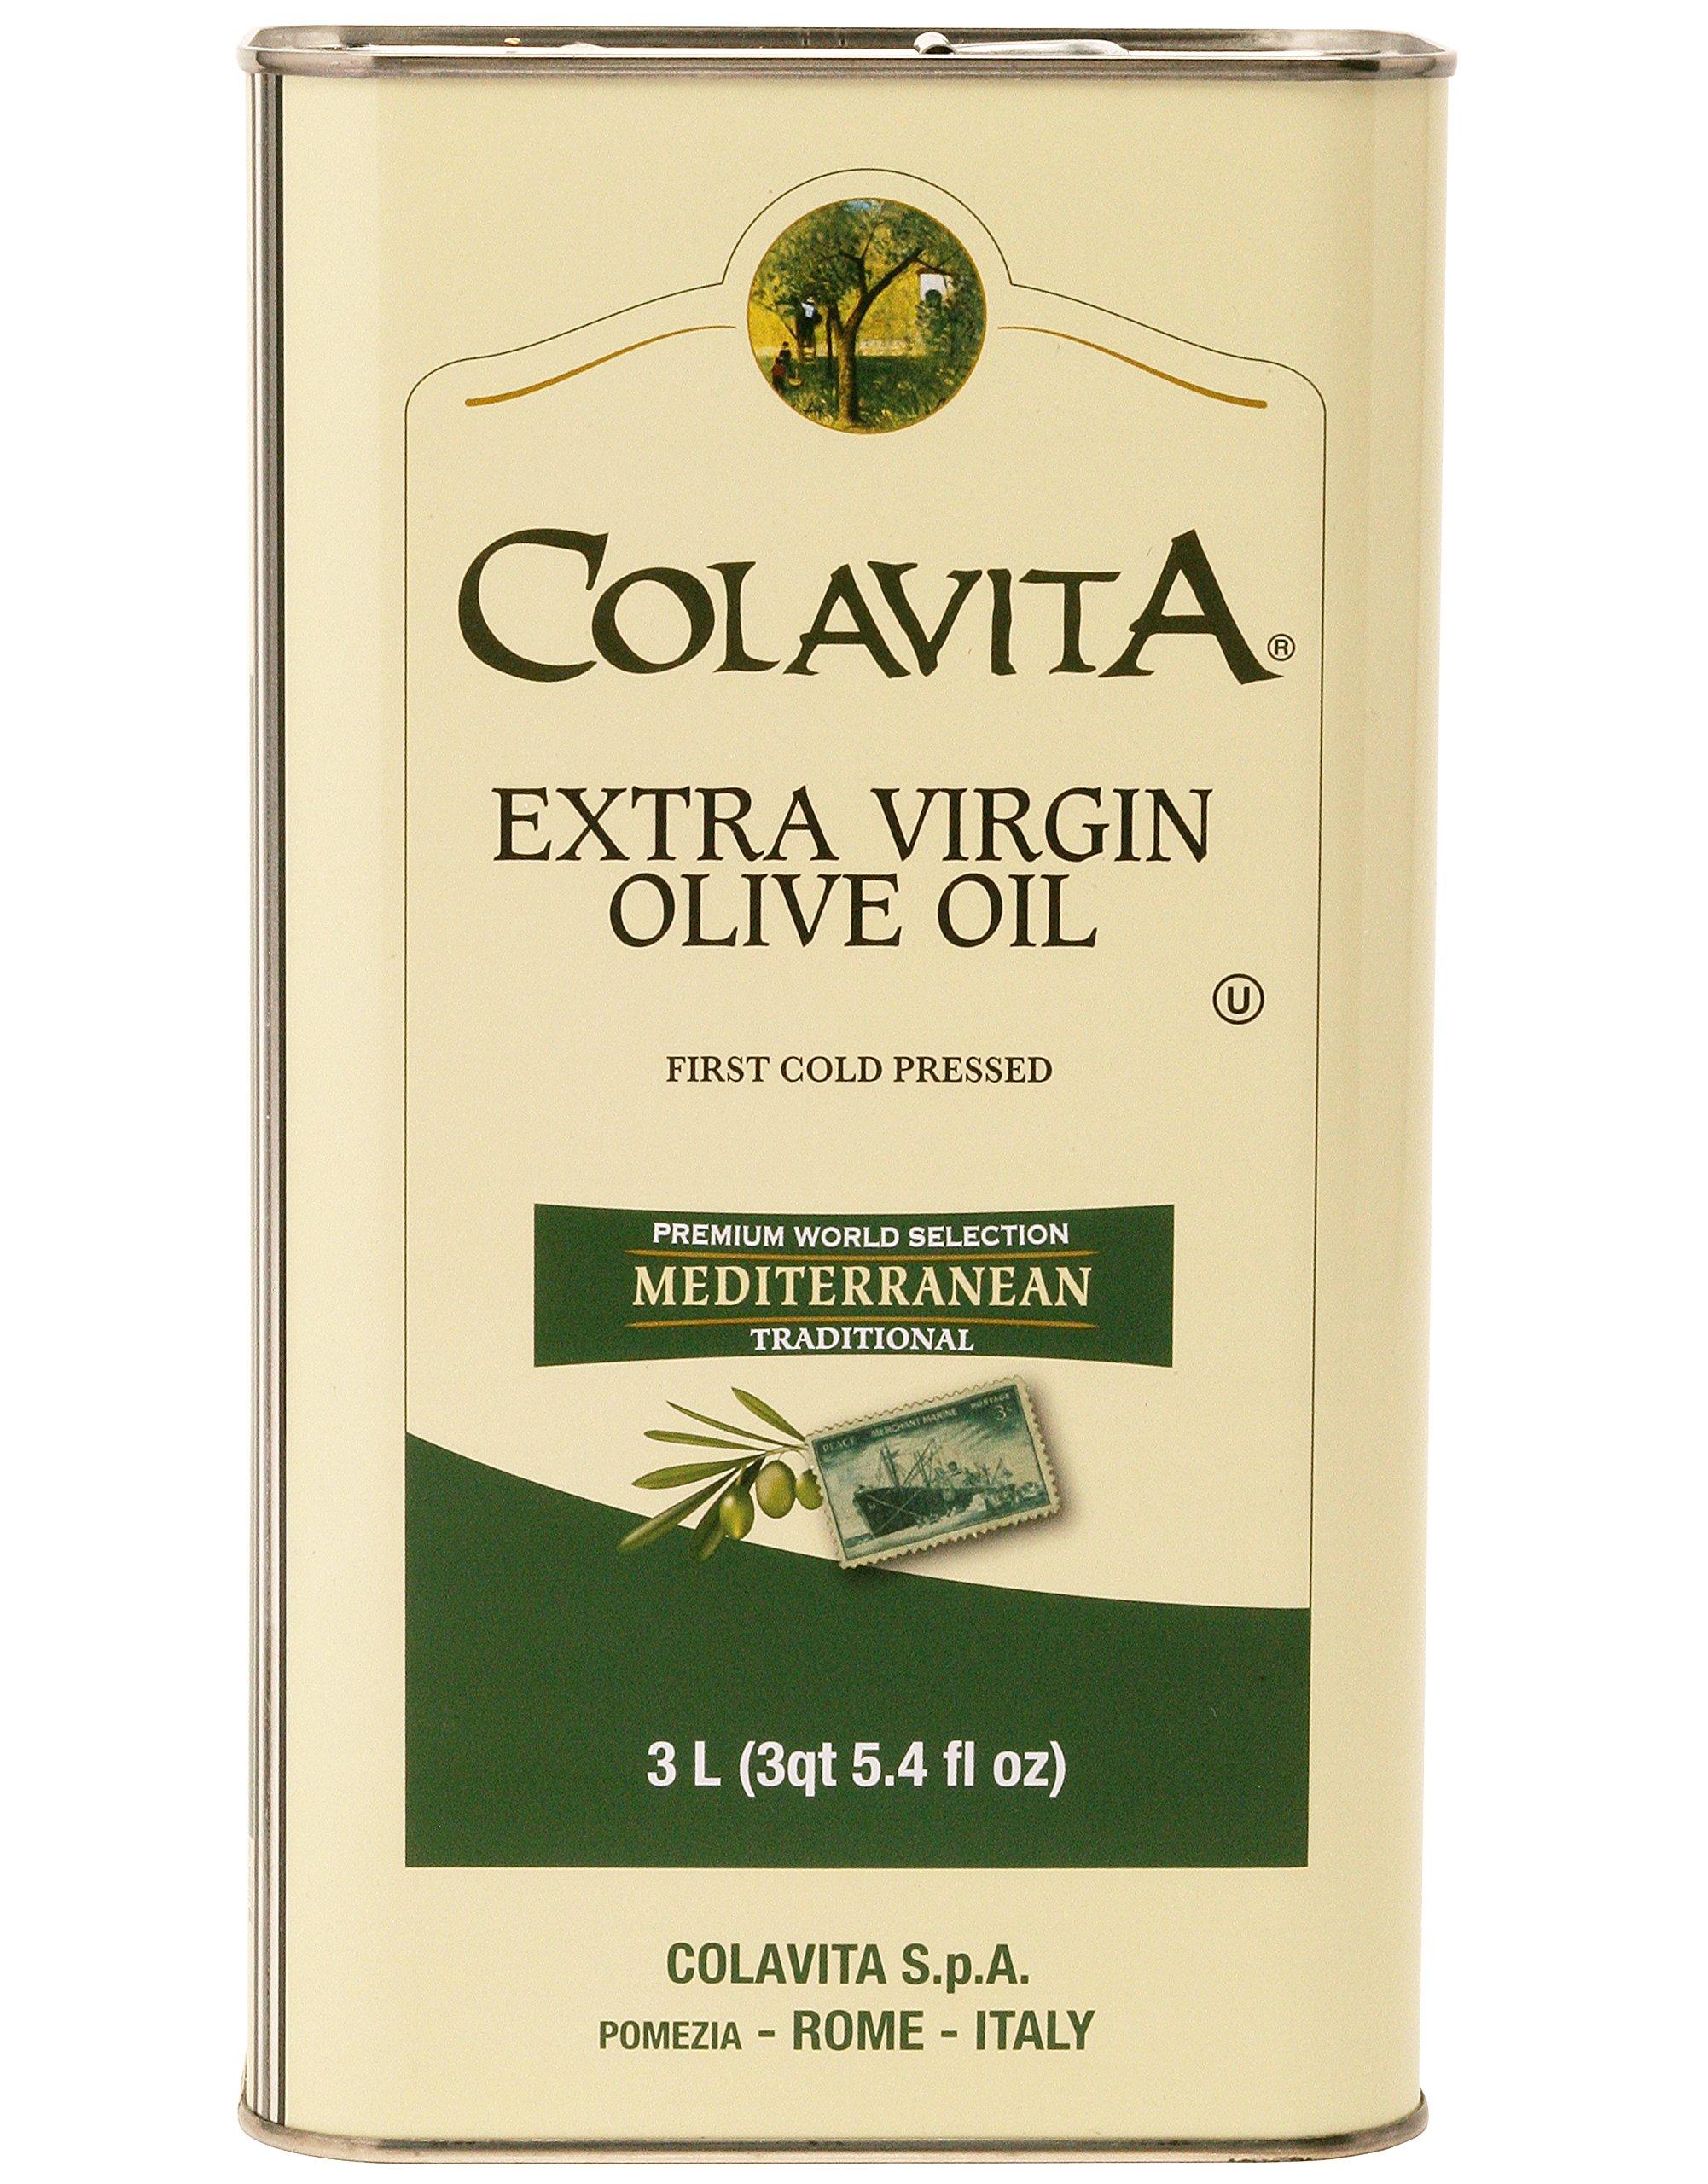 Colavita Mediterranean Extra Virgin Olive Oil Tin, 101.5 Ounce by Colavita